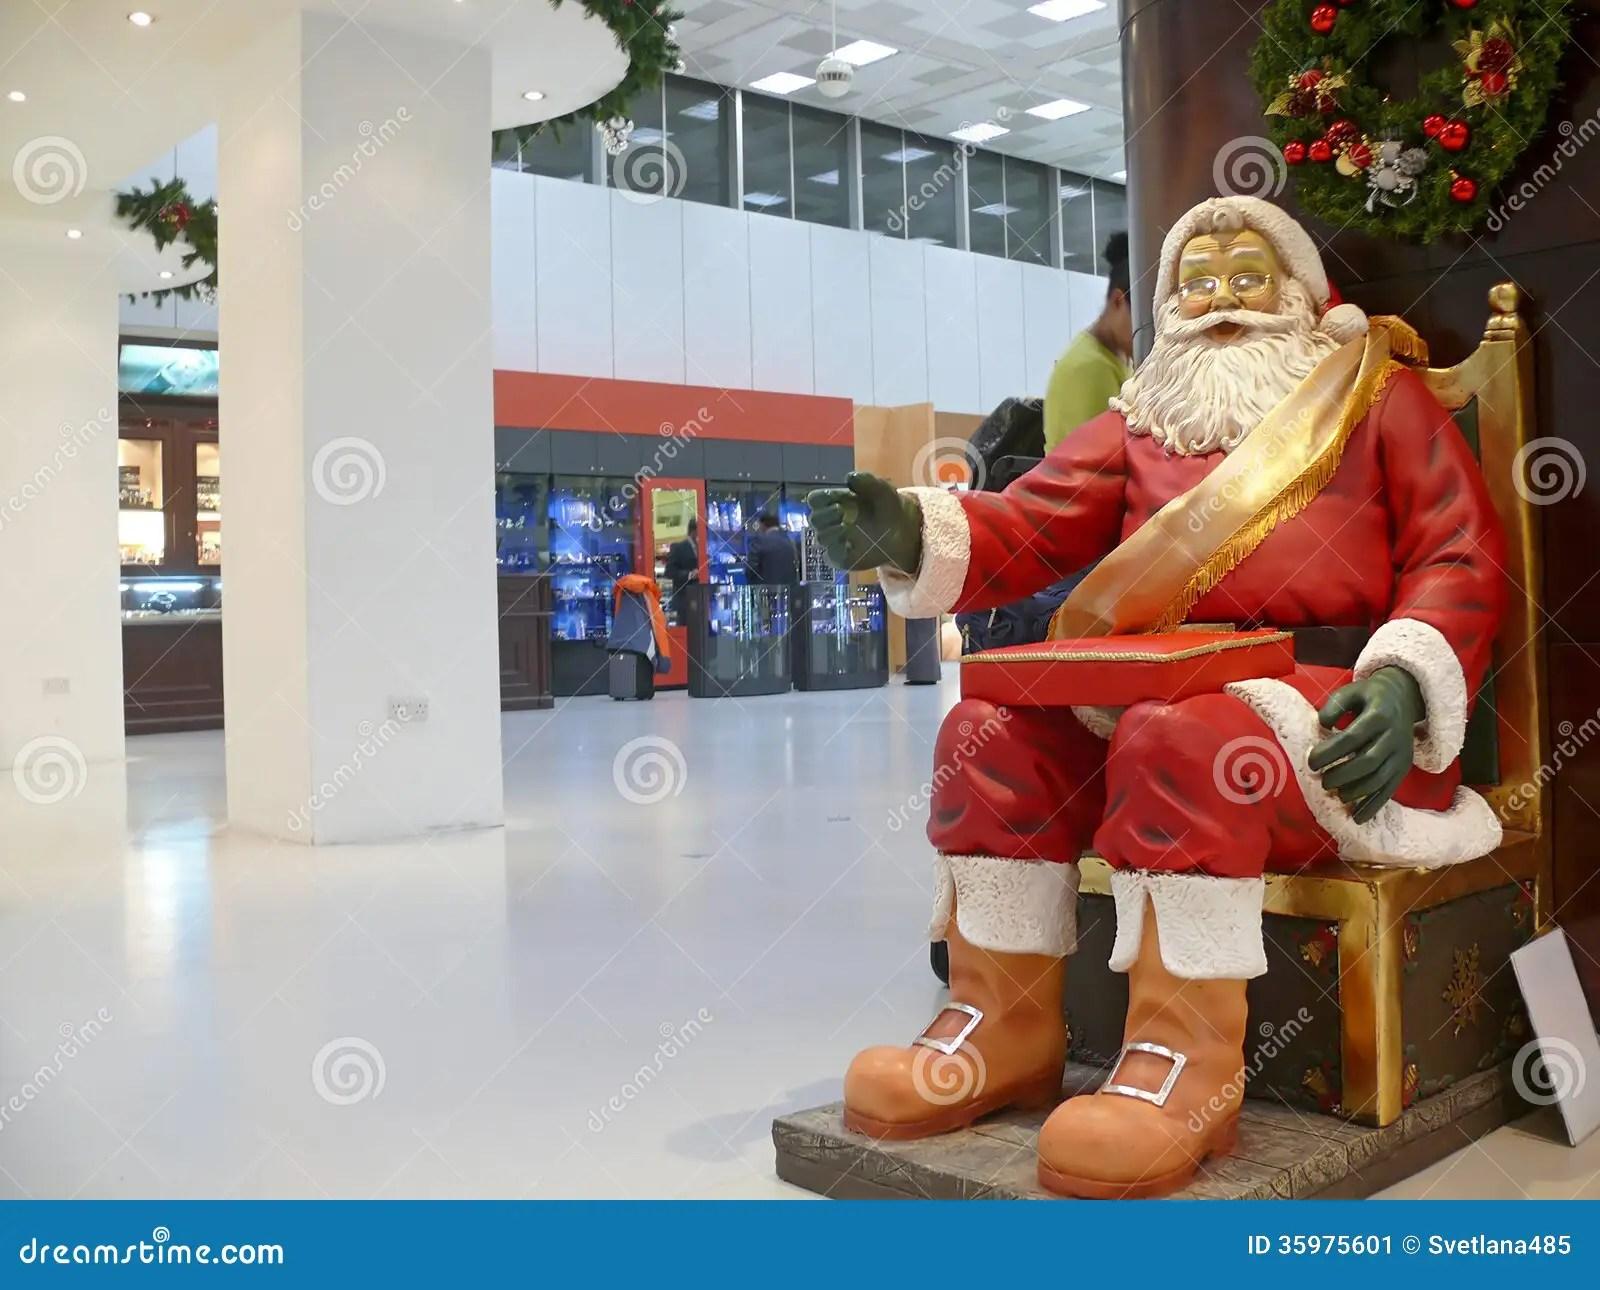 Dammam King Fahd International Airport Statue Of Santa